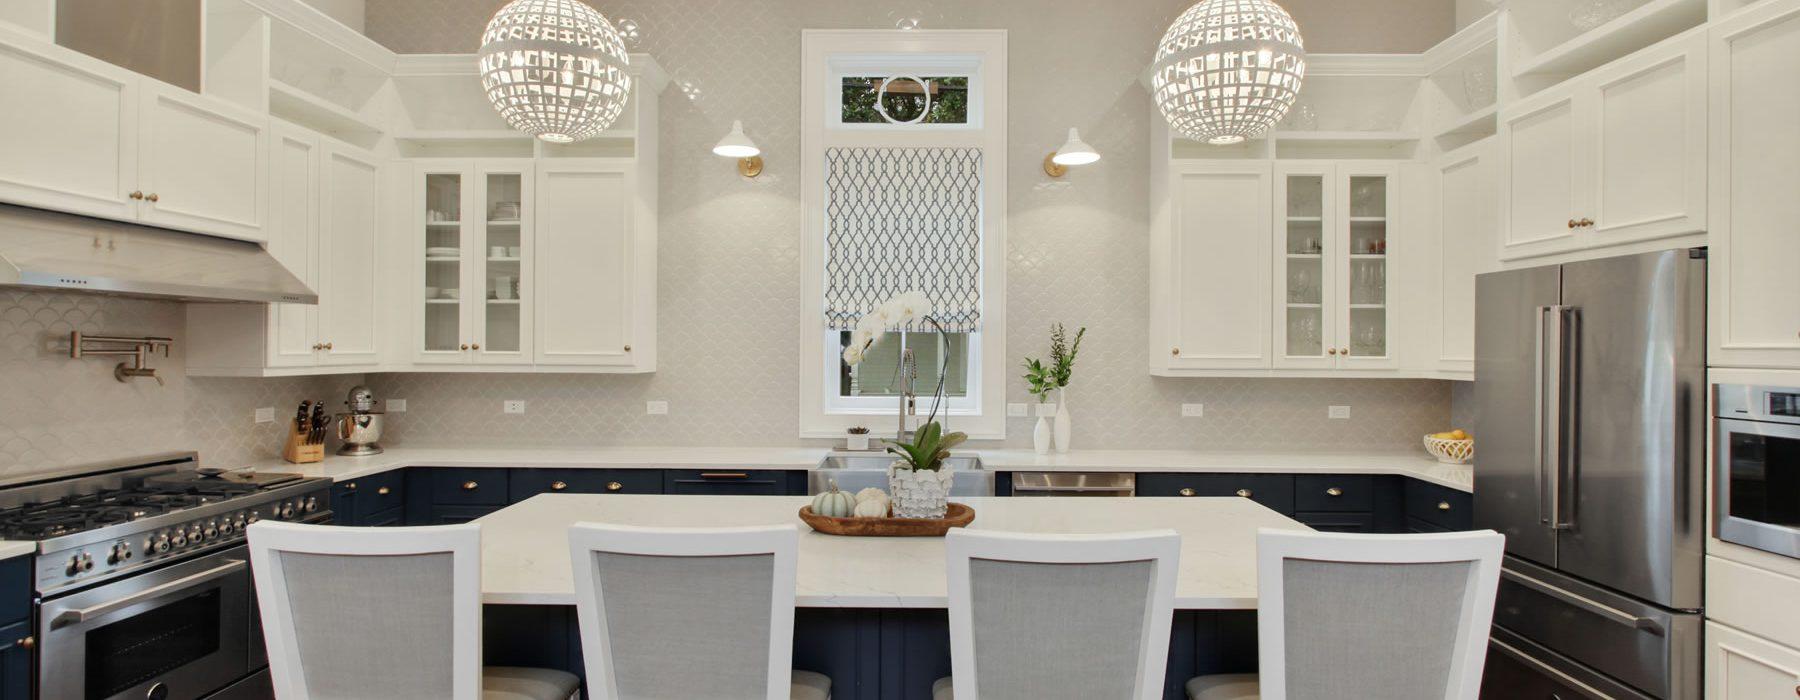 Kitchen Dining Room Portfolio Dmg Design Build Remodel Ideas